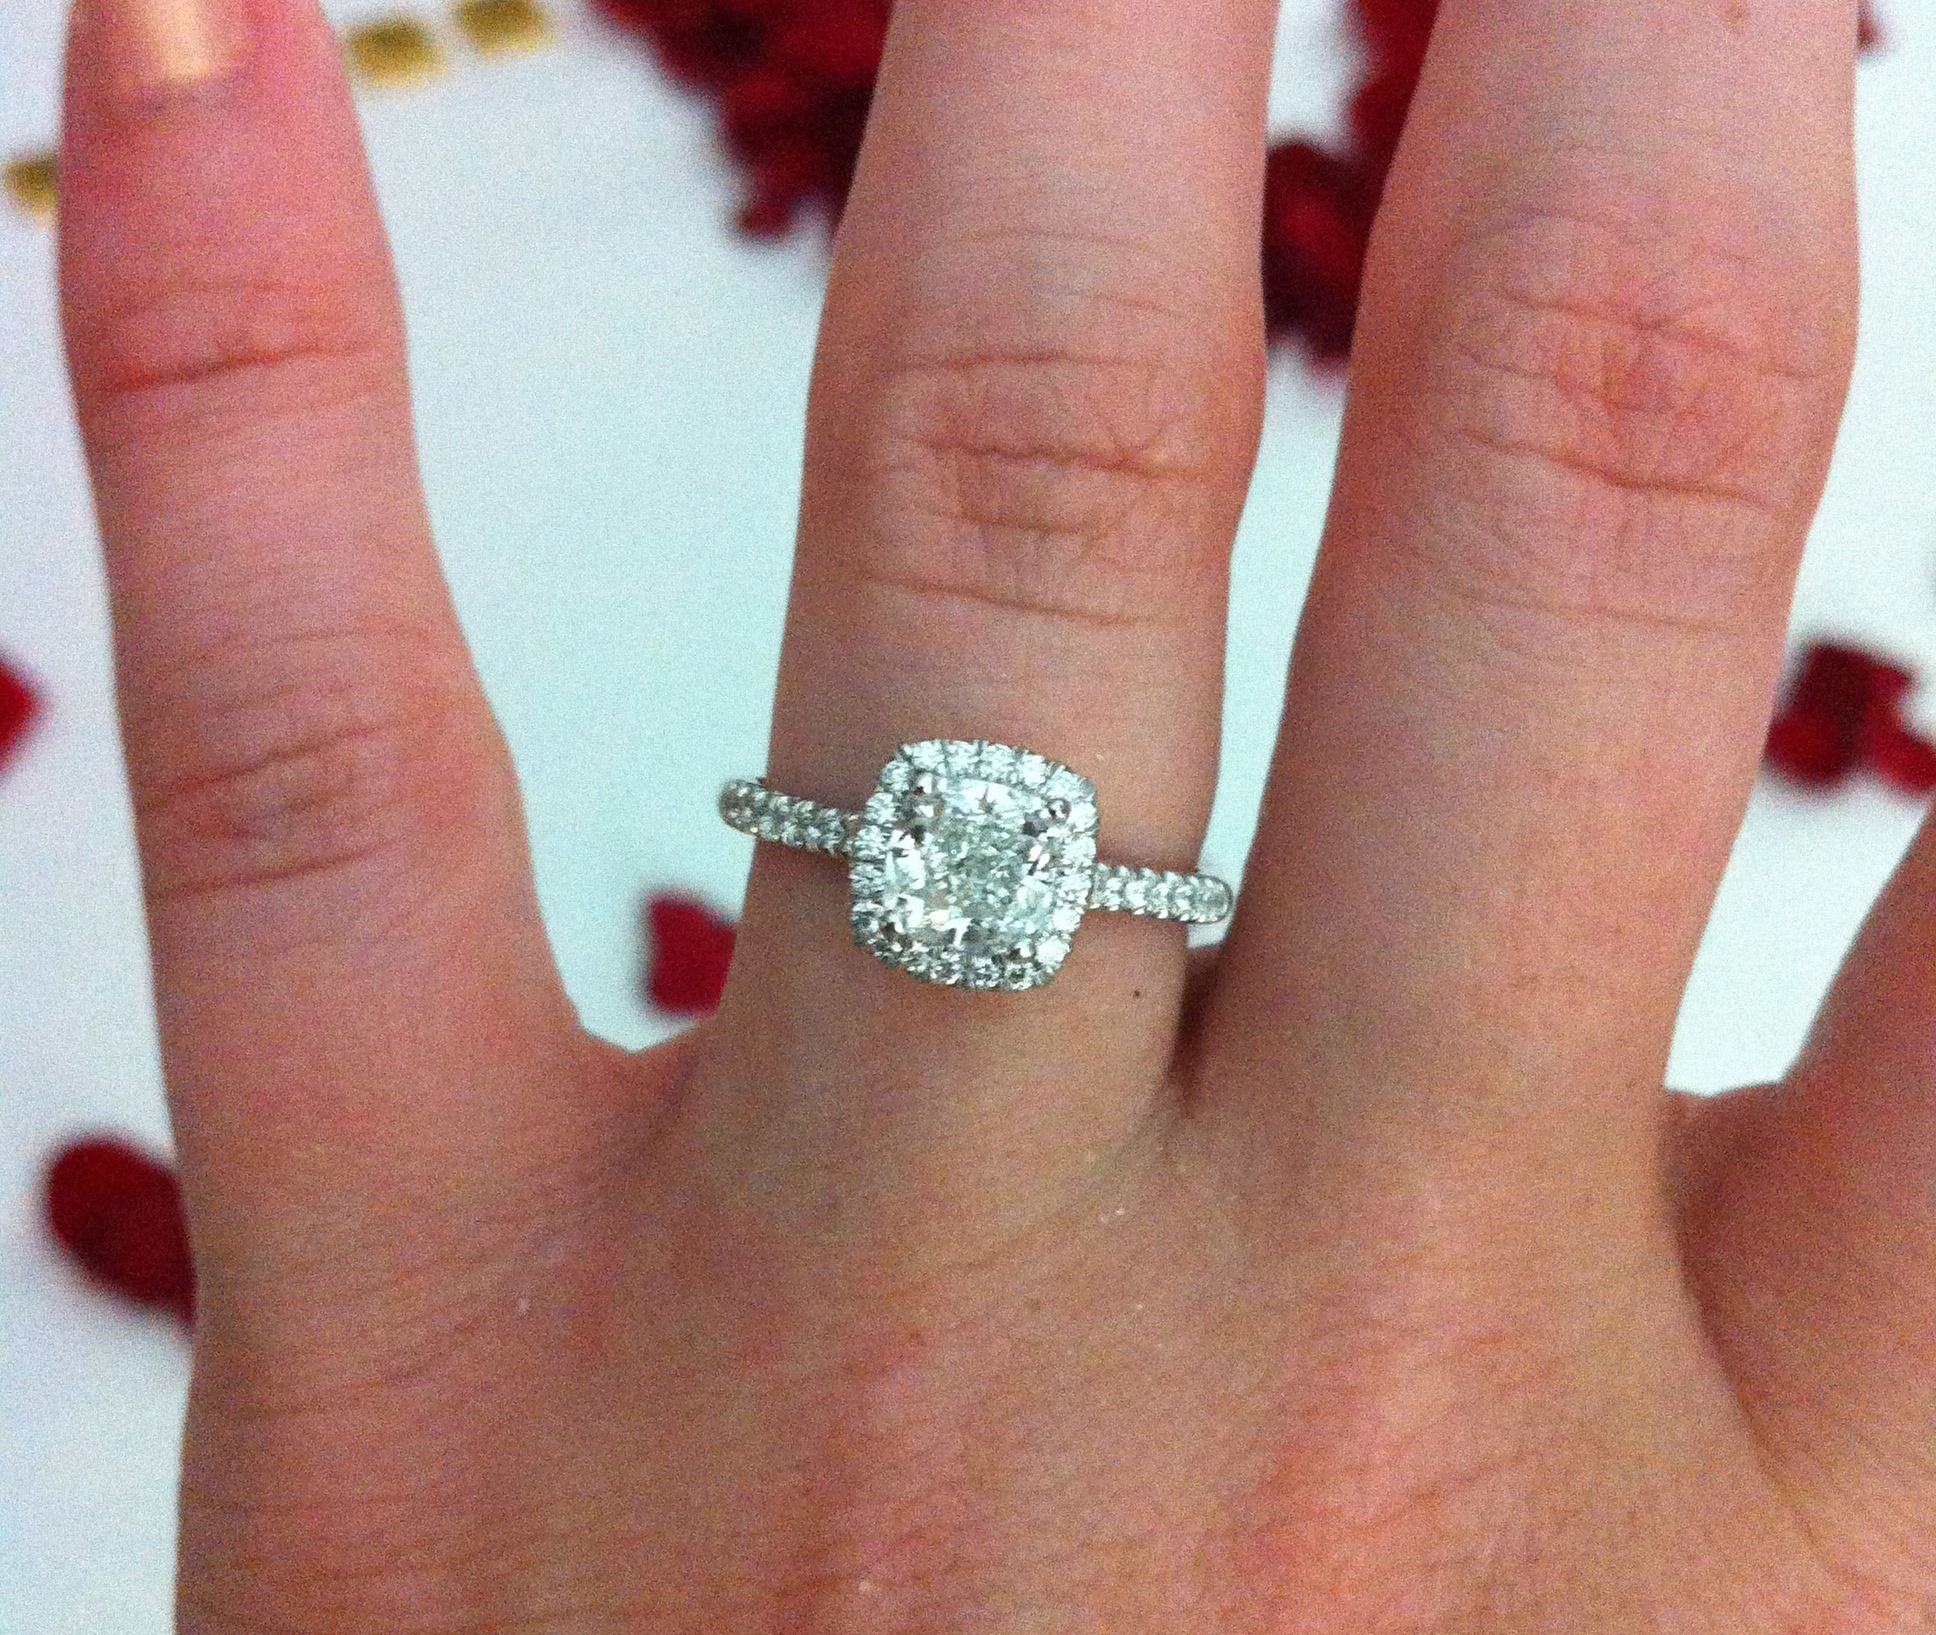 853159d34abd7 14K White Gold Pavé Halo Engagement Ring with Cushion Cut Diamond ...